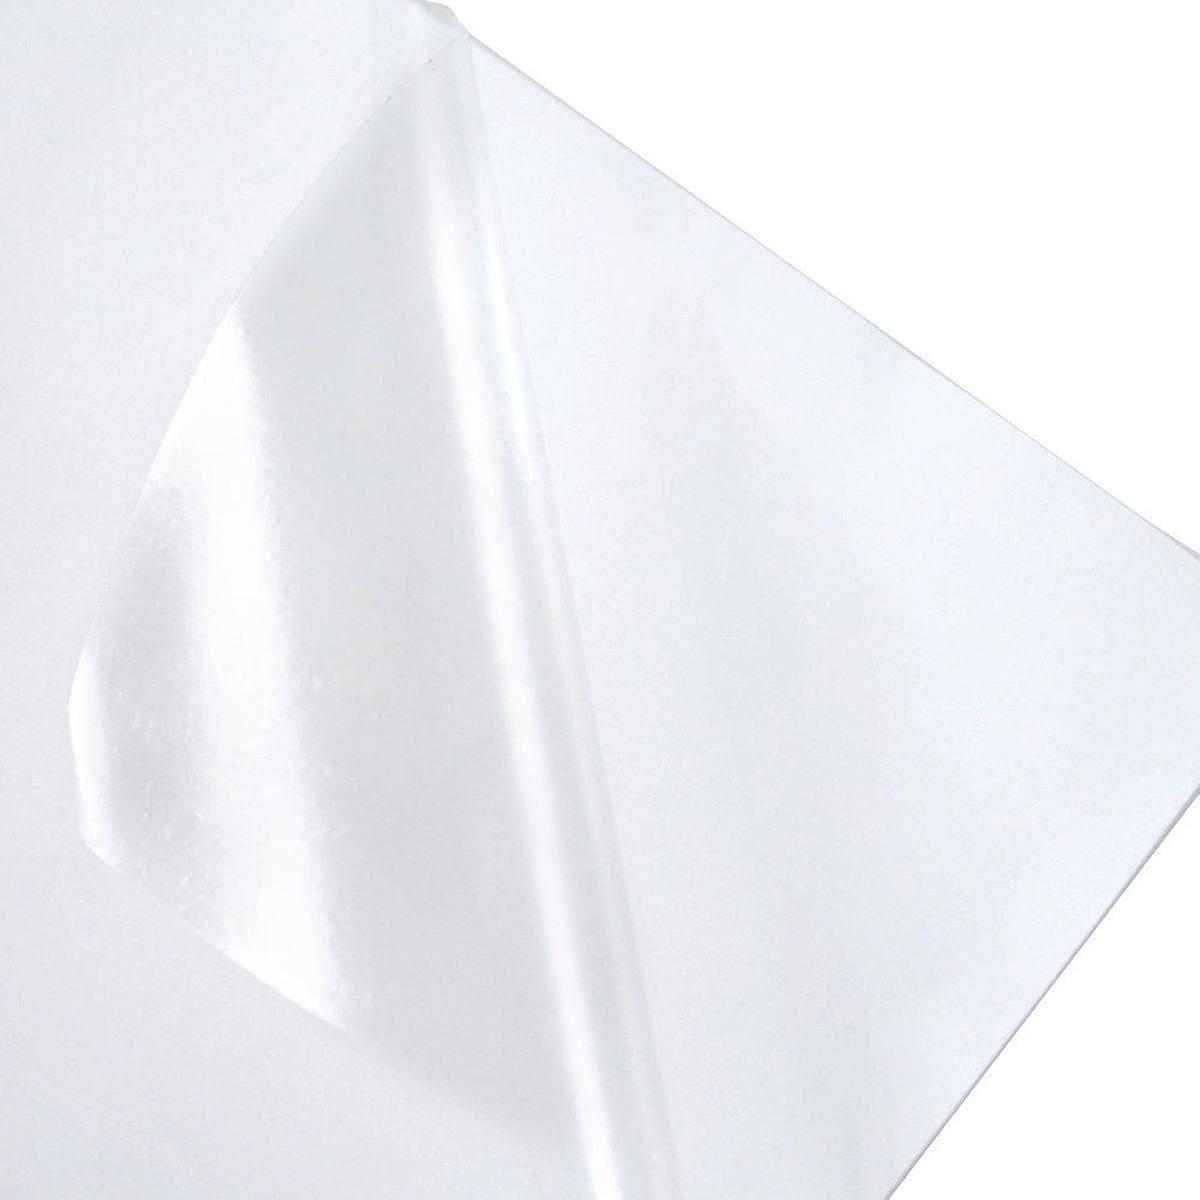 Vinil Transparente Adesivo Brilhante 150g A4 210mmx297mm PVC Autoadesivo / 100 folhas